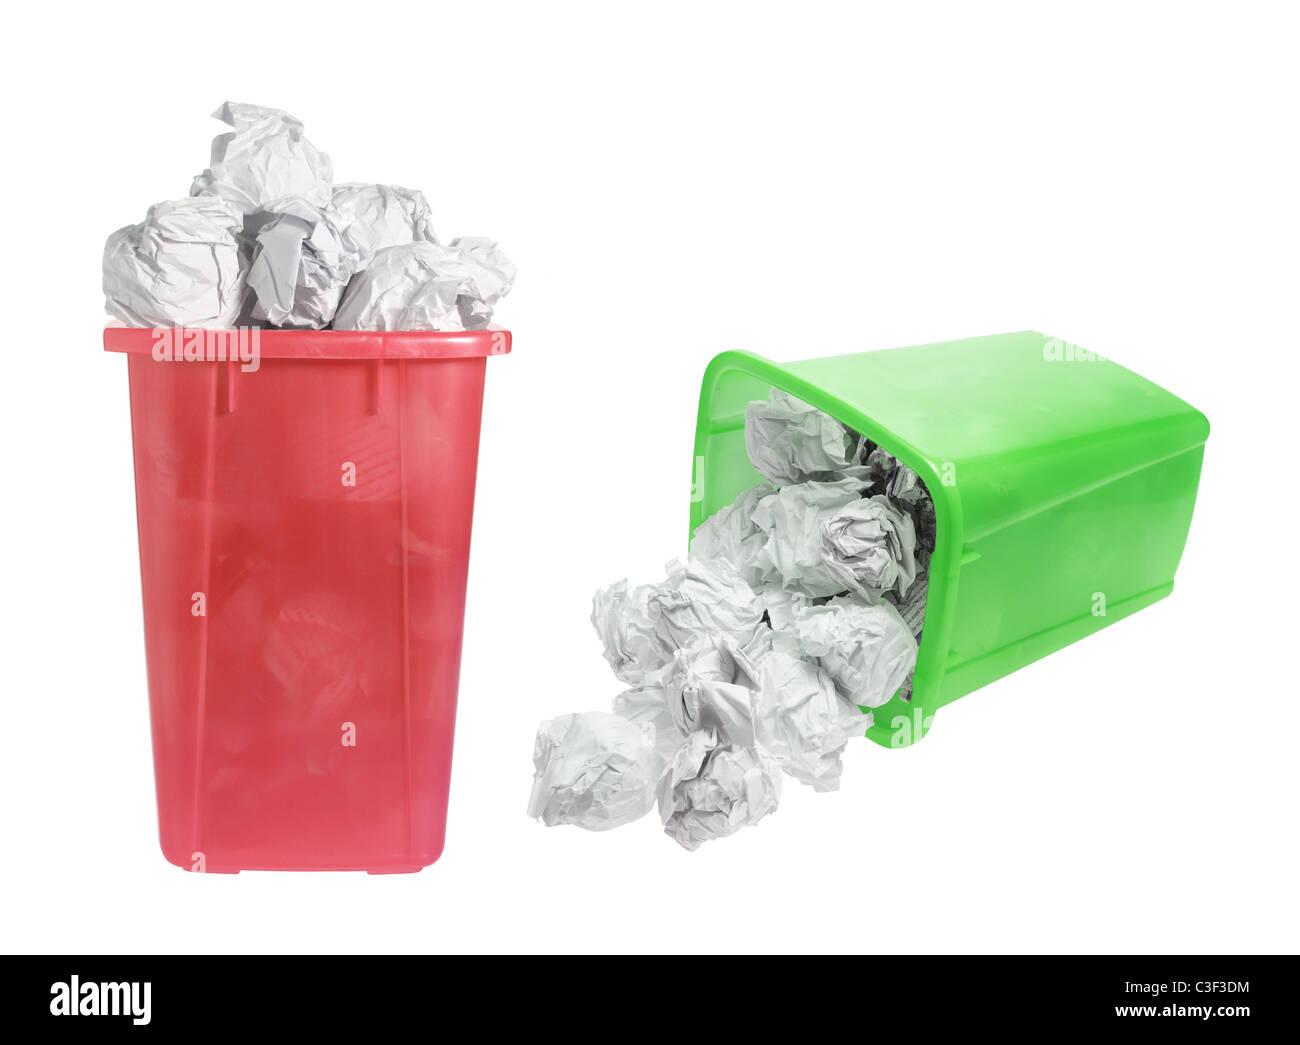 Waste Paper Bins Stock Photo